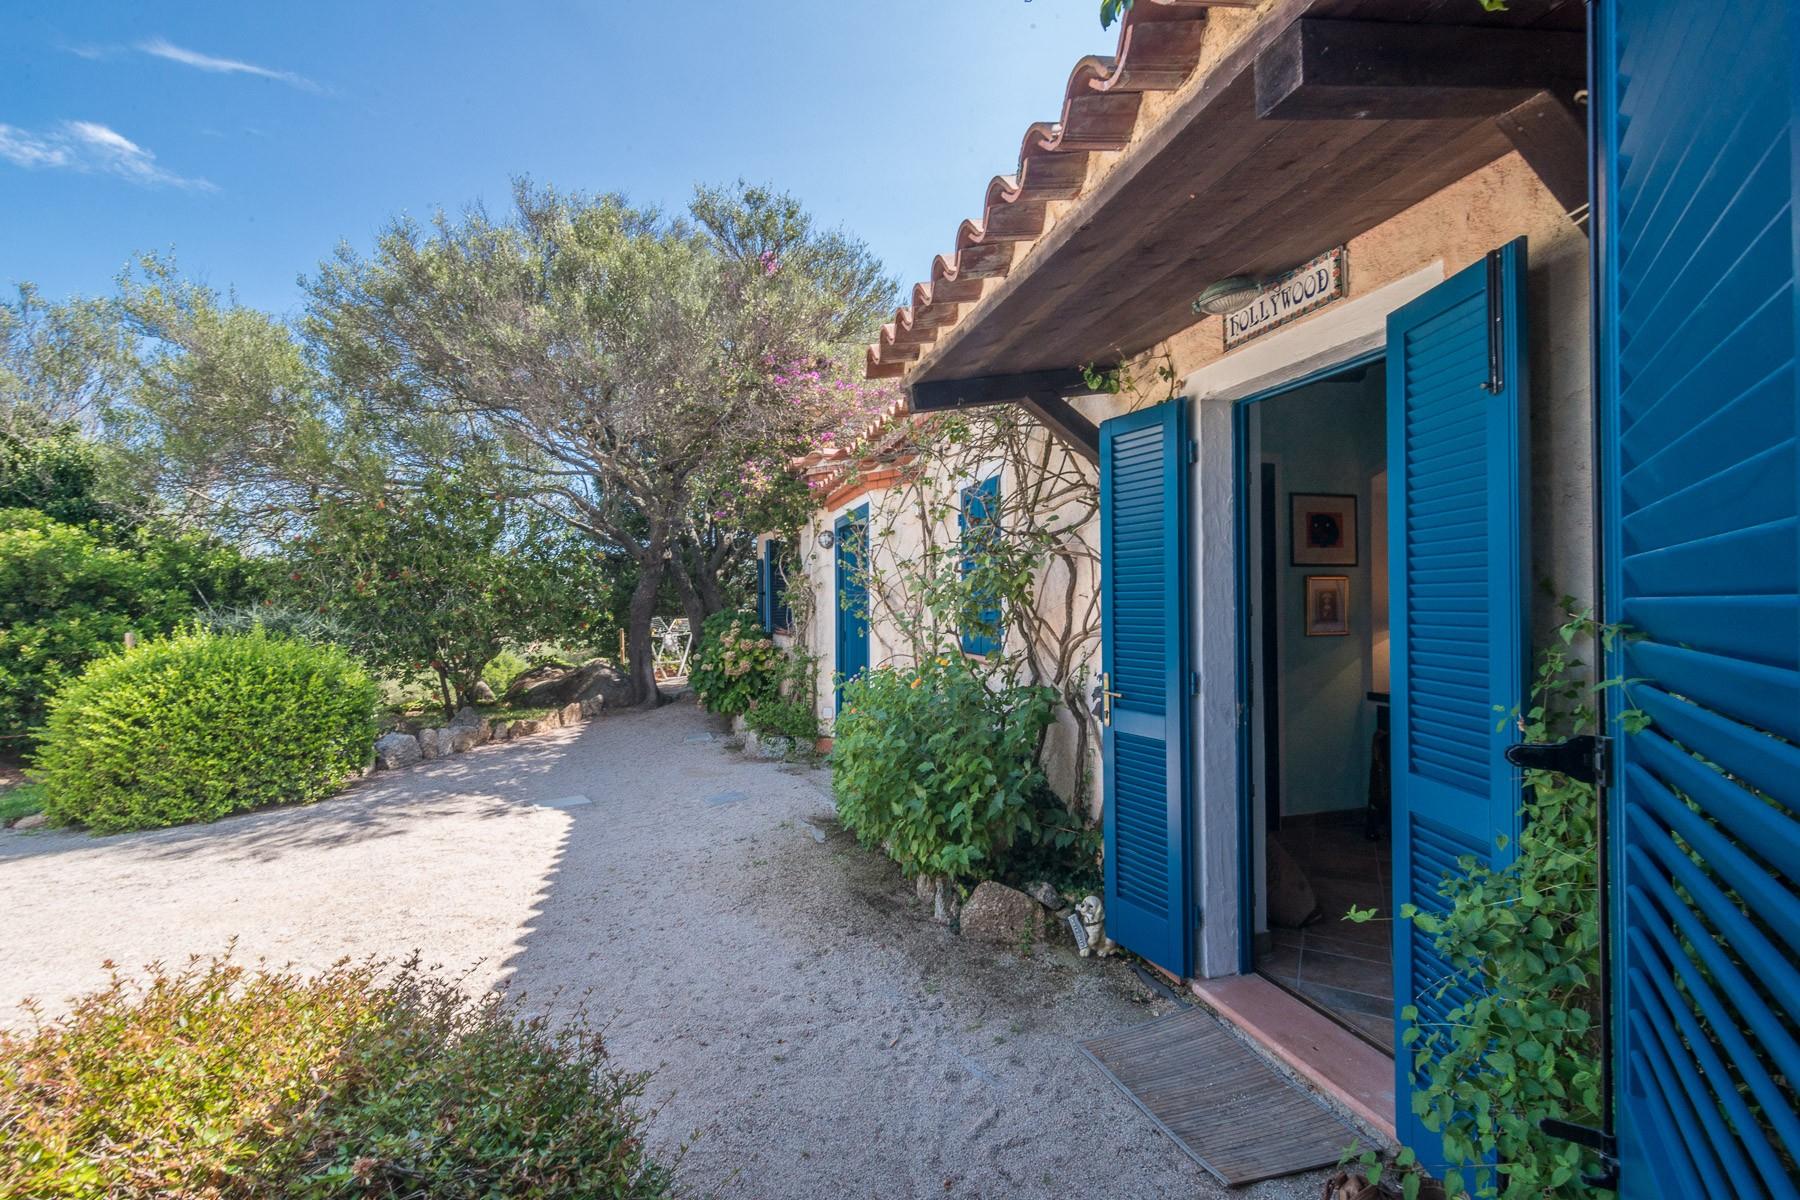 Casa indipendente in Vendita a Olbia: 5 locali, 230 mq - Foto 24